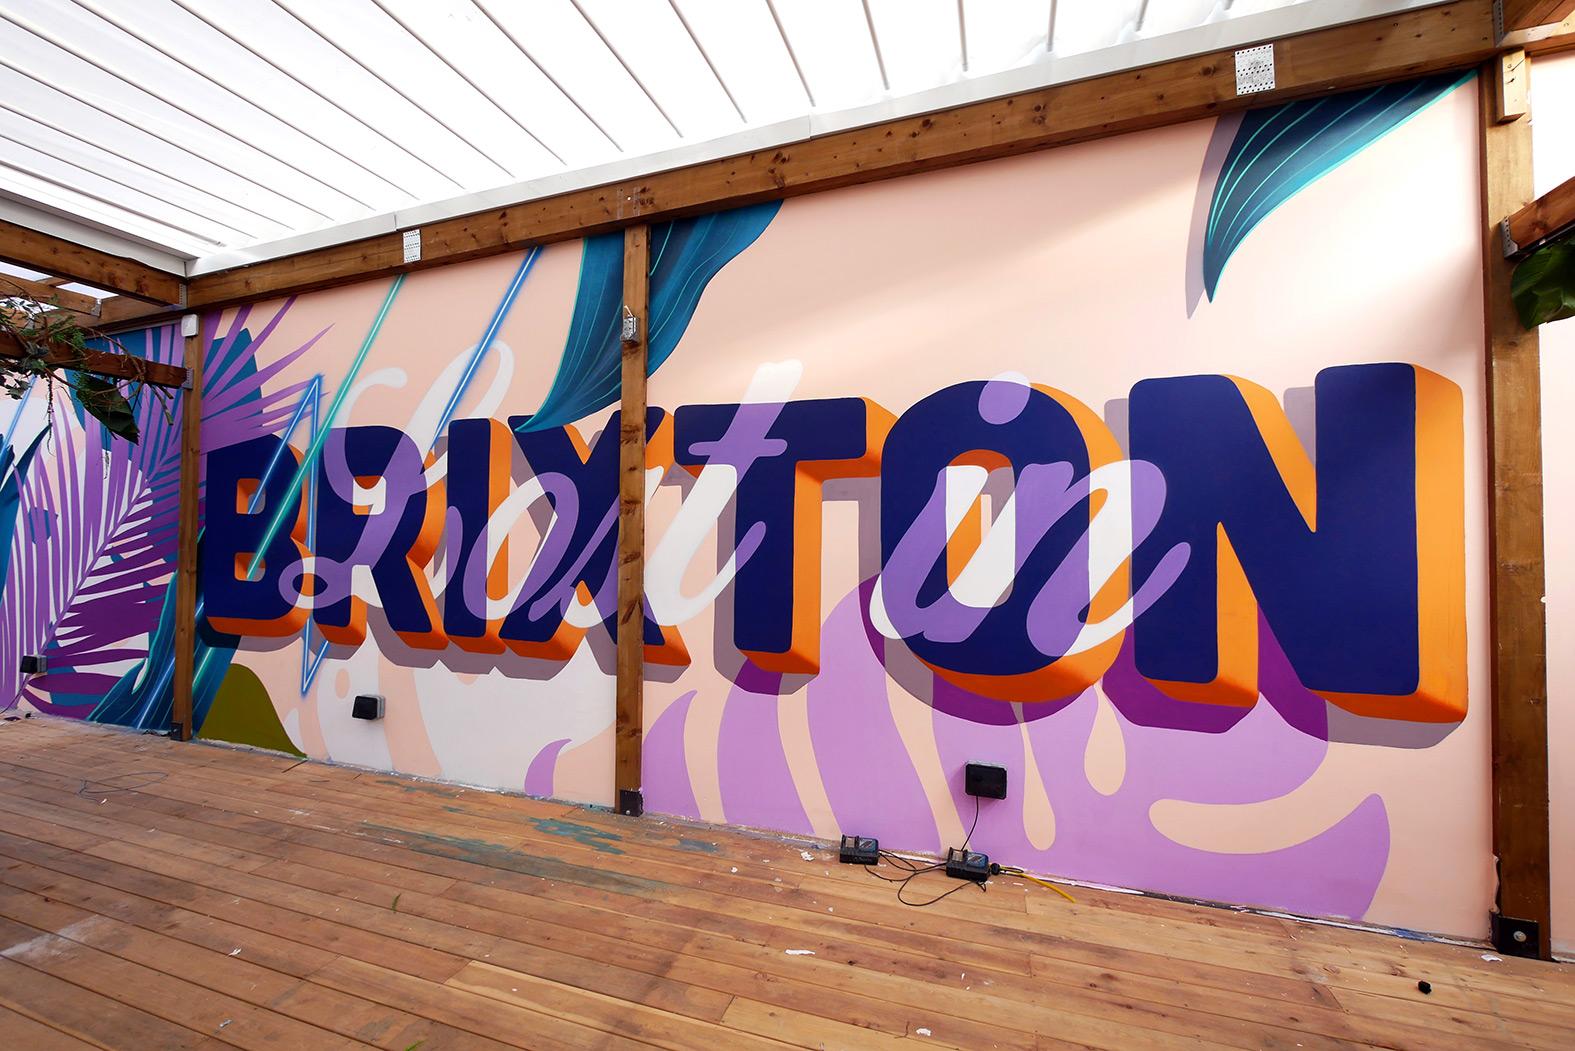 Nerone-lost-in-brixton-mural-painting-street-art-11